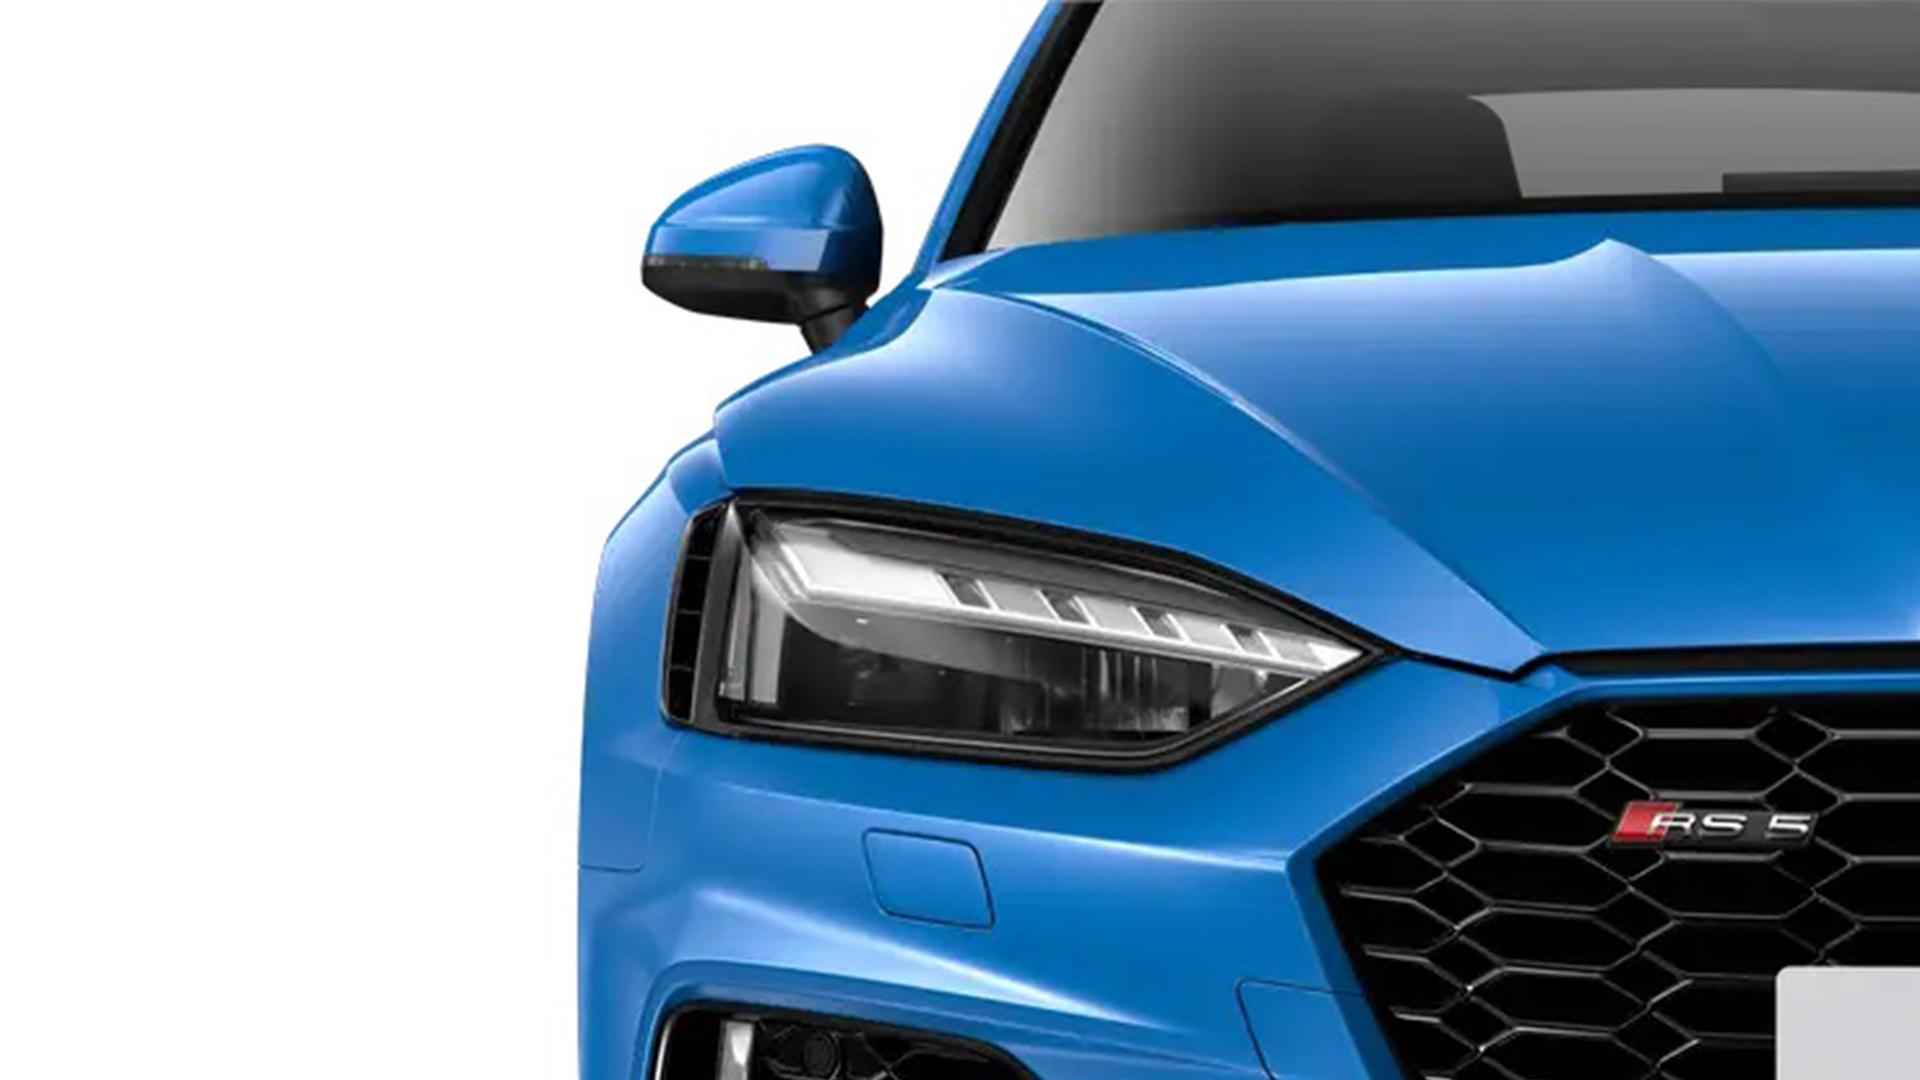 Audi RS 5 2021 Sportback Exterior